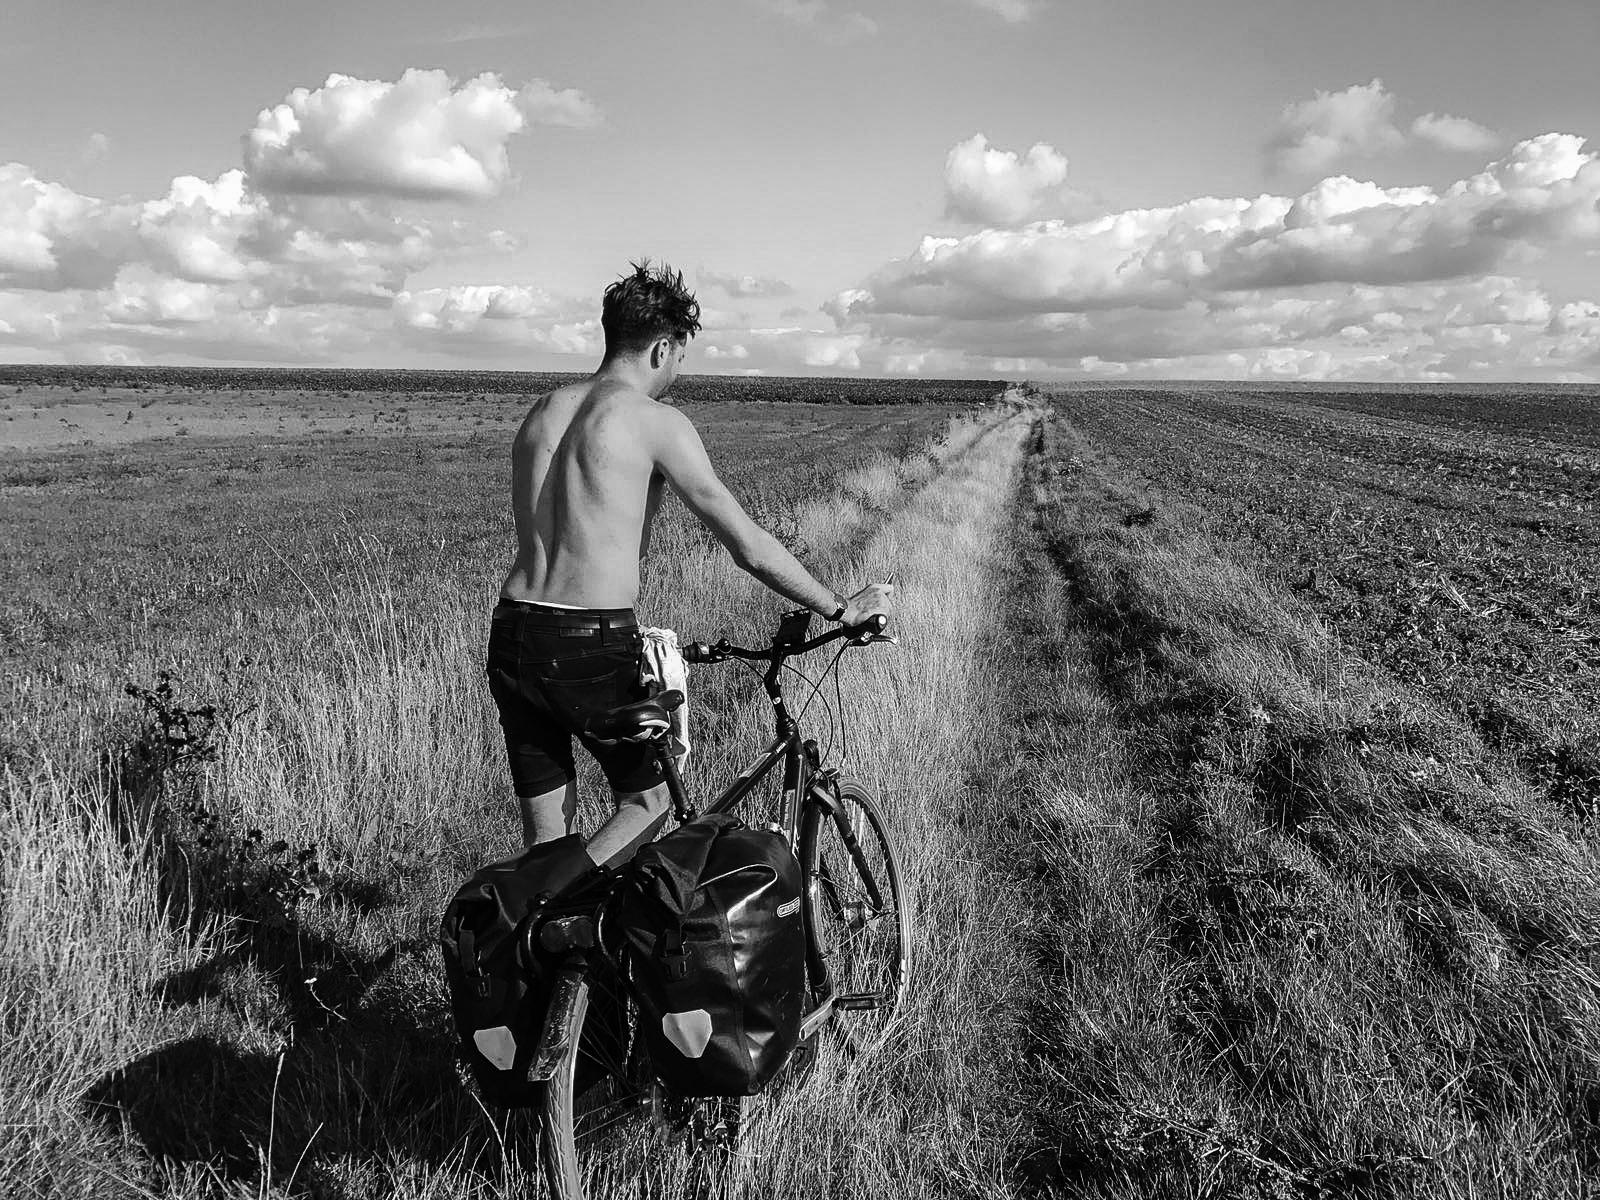 Tom_Oliver_Payne_London_to_Paris_Cycle-22.jpg